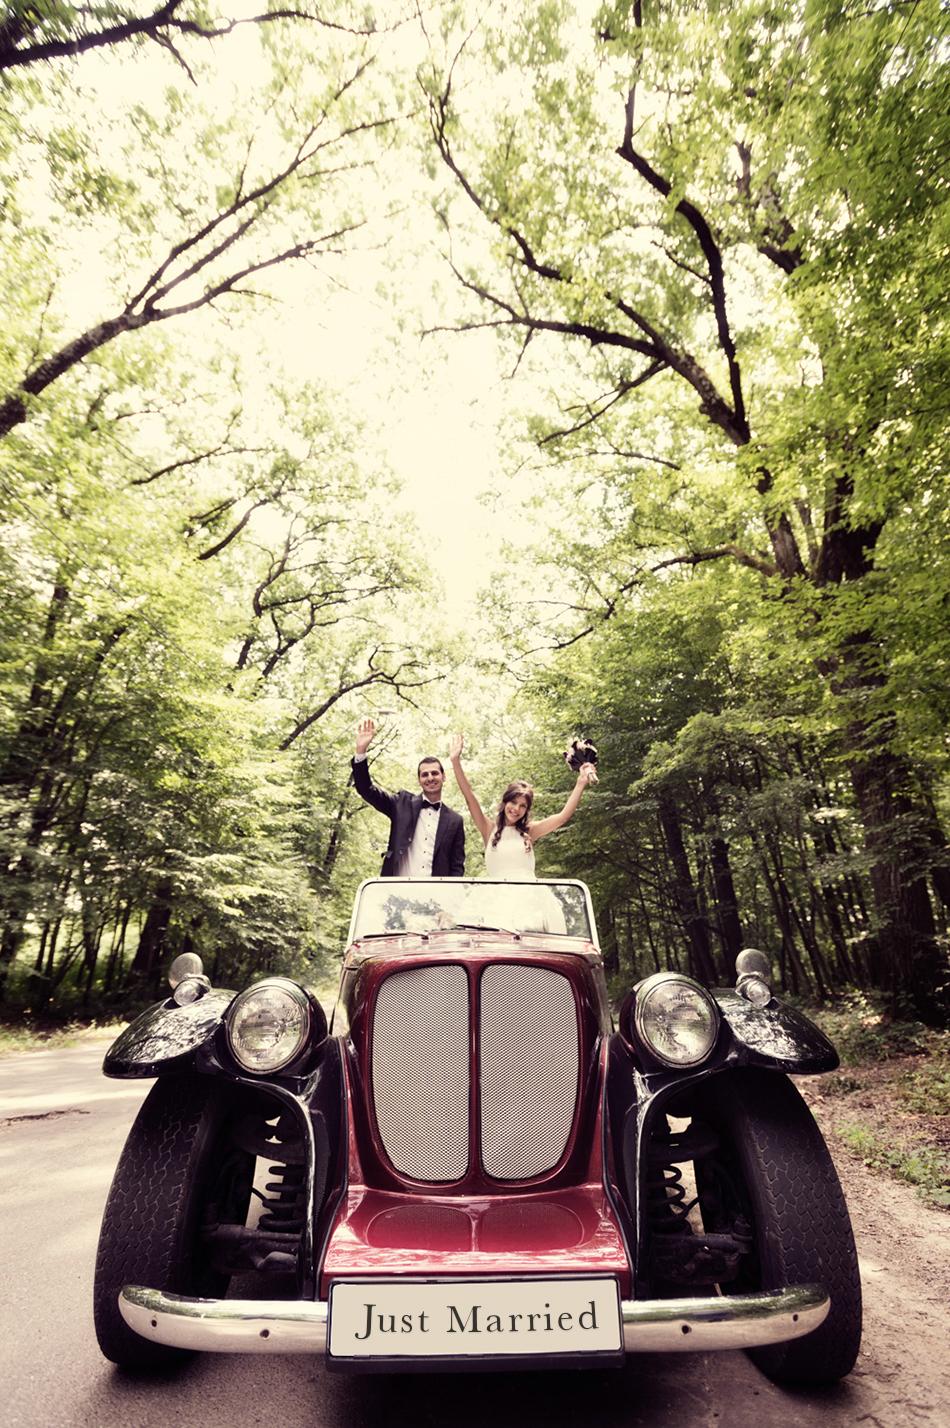 AD Passion Photography | fotograf-nunta-vintage_ad-passion_anda-marius_nunta-in-pitesti_0085 | Adelin, Dida, fotograf profesionist, fotograf de nunta, fotografie de nunta, fotograf Timisoara, fotograf Craiova, fotograf Bucuresti, fotograf Arad, nunta Timisoara, nunta Arad, nunta Bucuresti, nunta Craiova